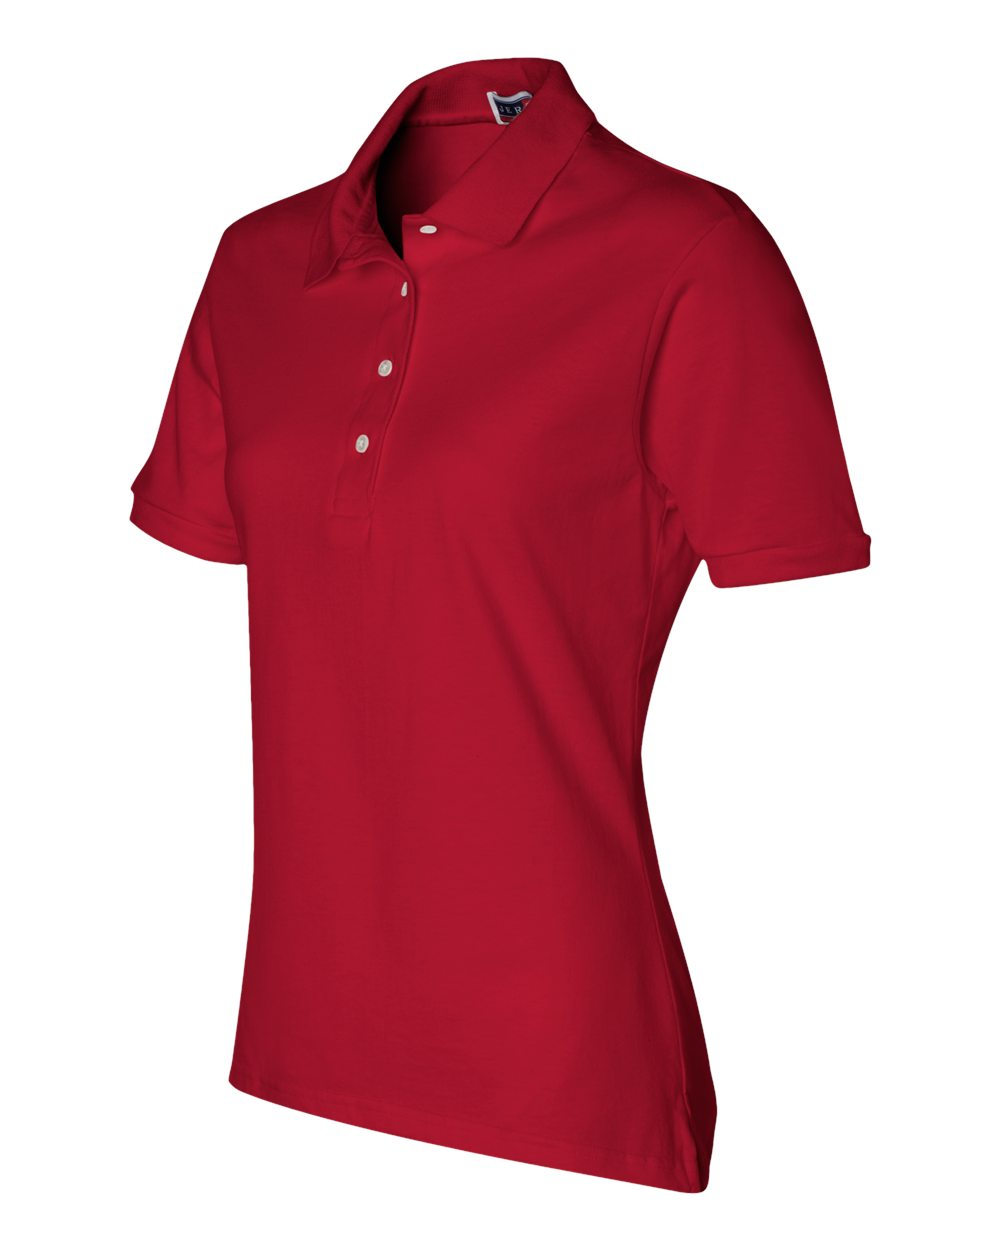 Jerzees-Women-039-s-5-6-oz-50-50-Jersey-Polo-with-SpotShield-437W-S-2XL thumbnail 3